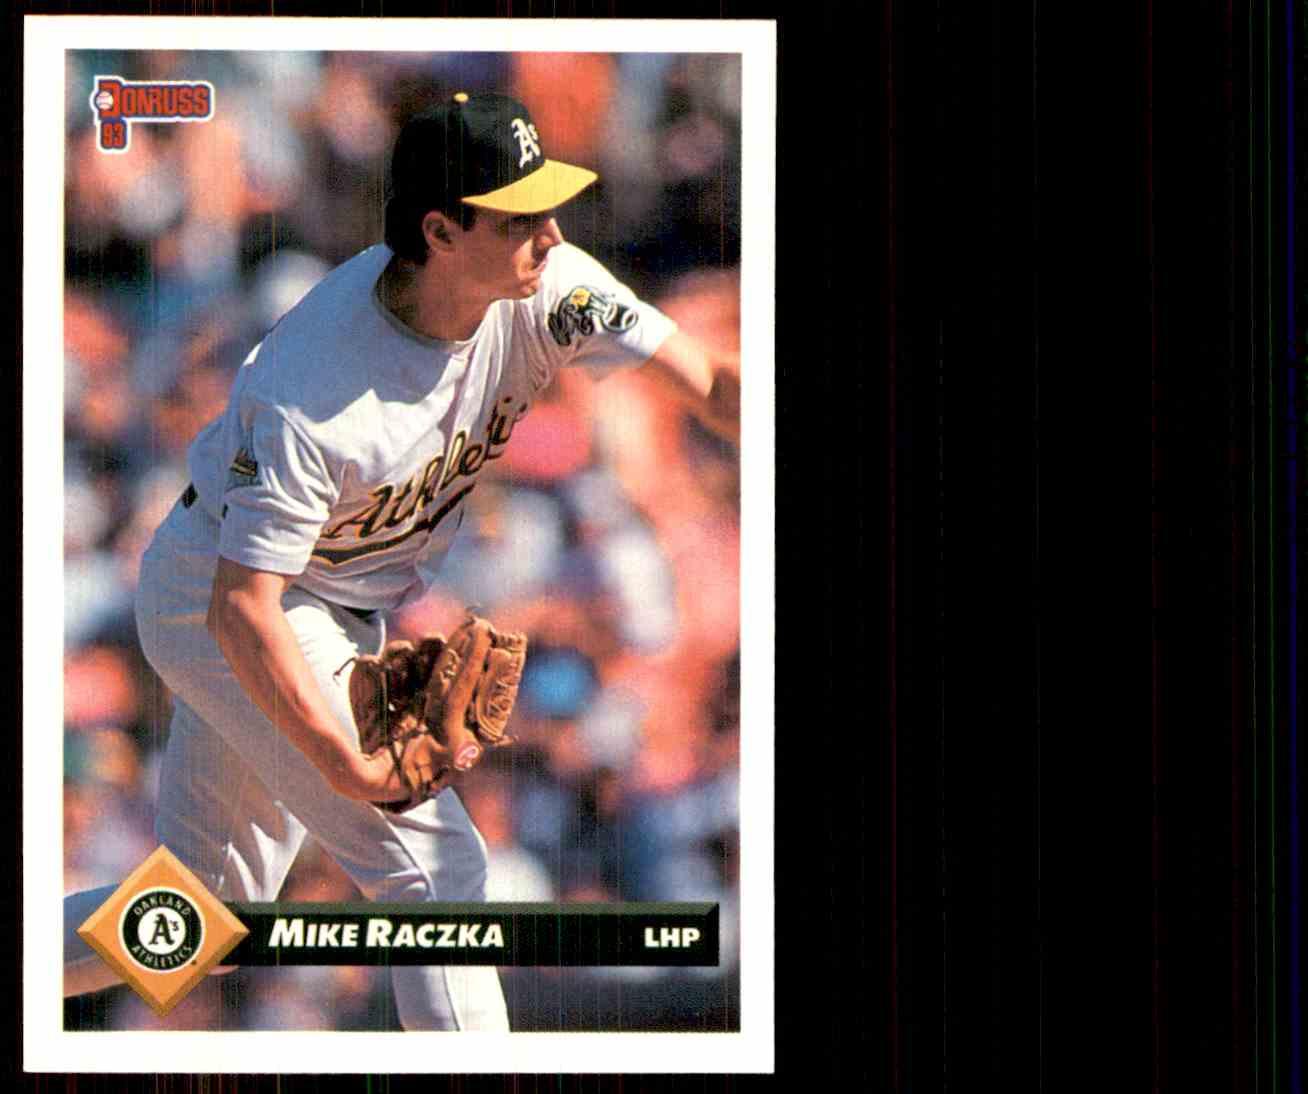 1993 Donruss Mike Raczka #183 card front image